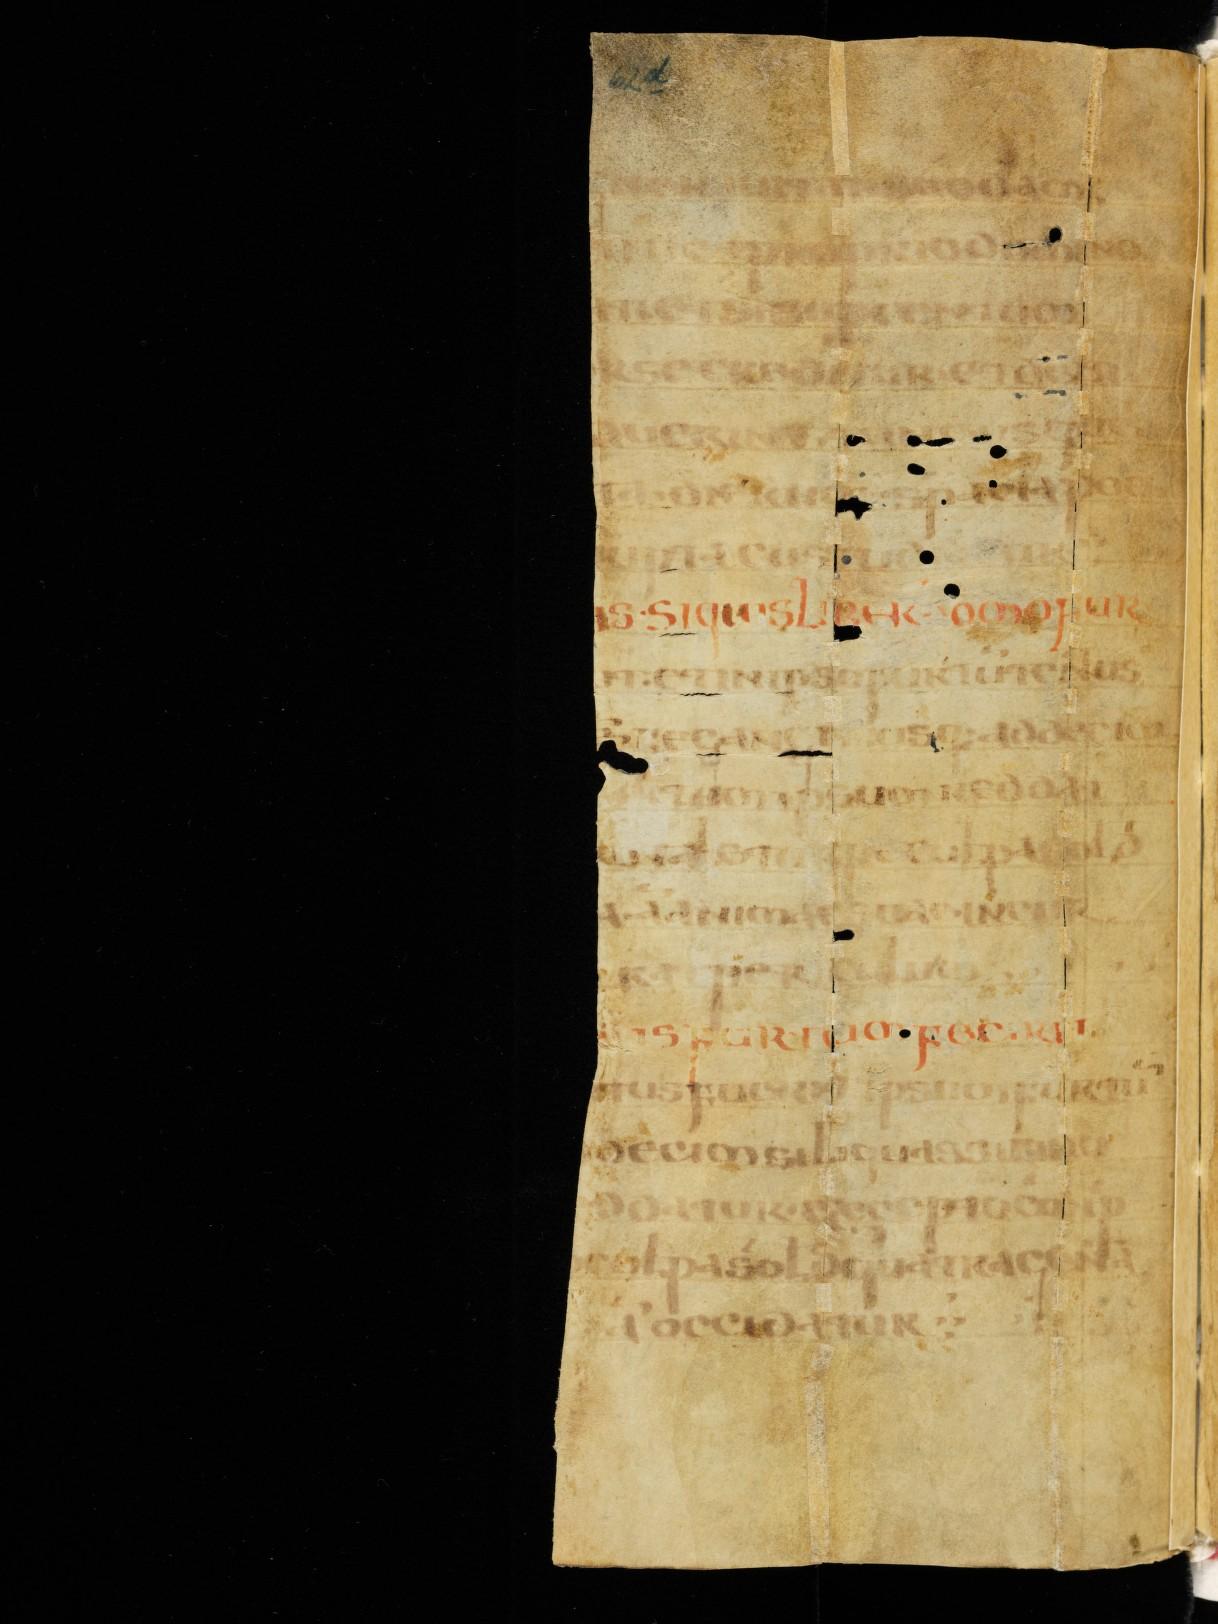 Cod. Sang. 730, p. 62d